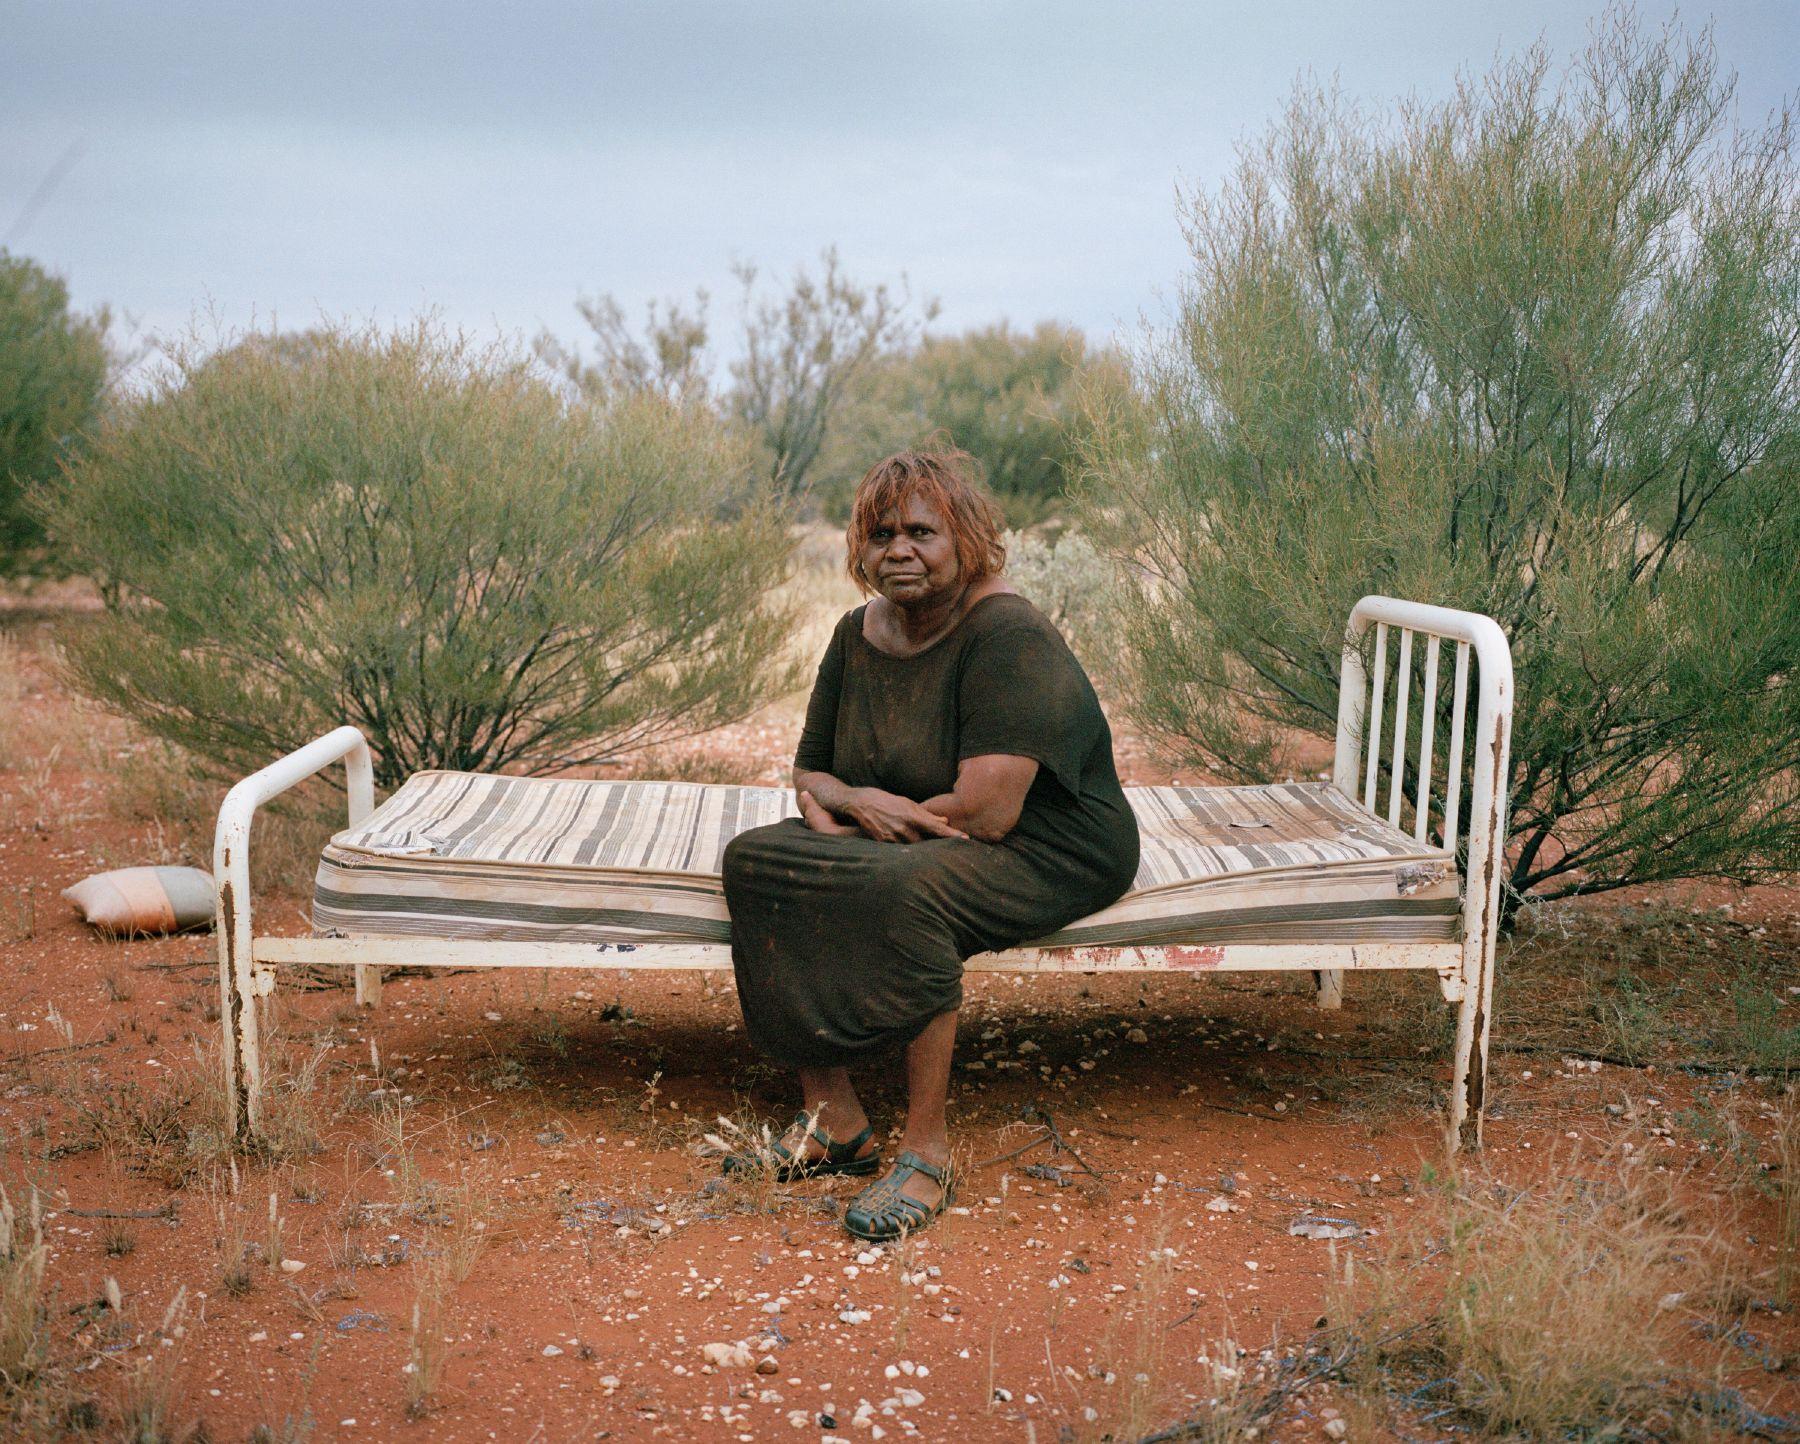 Daisy Ward, an Aboriginal-Australian elder from Warakurna Community, sits for a portrait at a 'sorry place' near Warakurna Community, Ngaanyatjarraku Shire, Western Australia on Mar. 8, 2017. Adam Ferguson